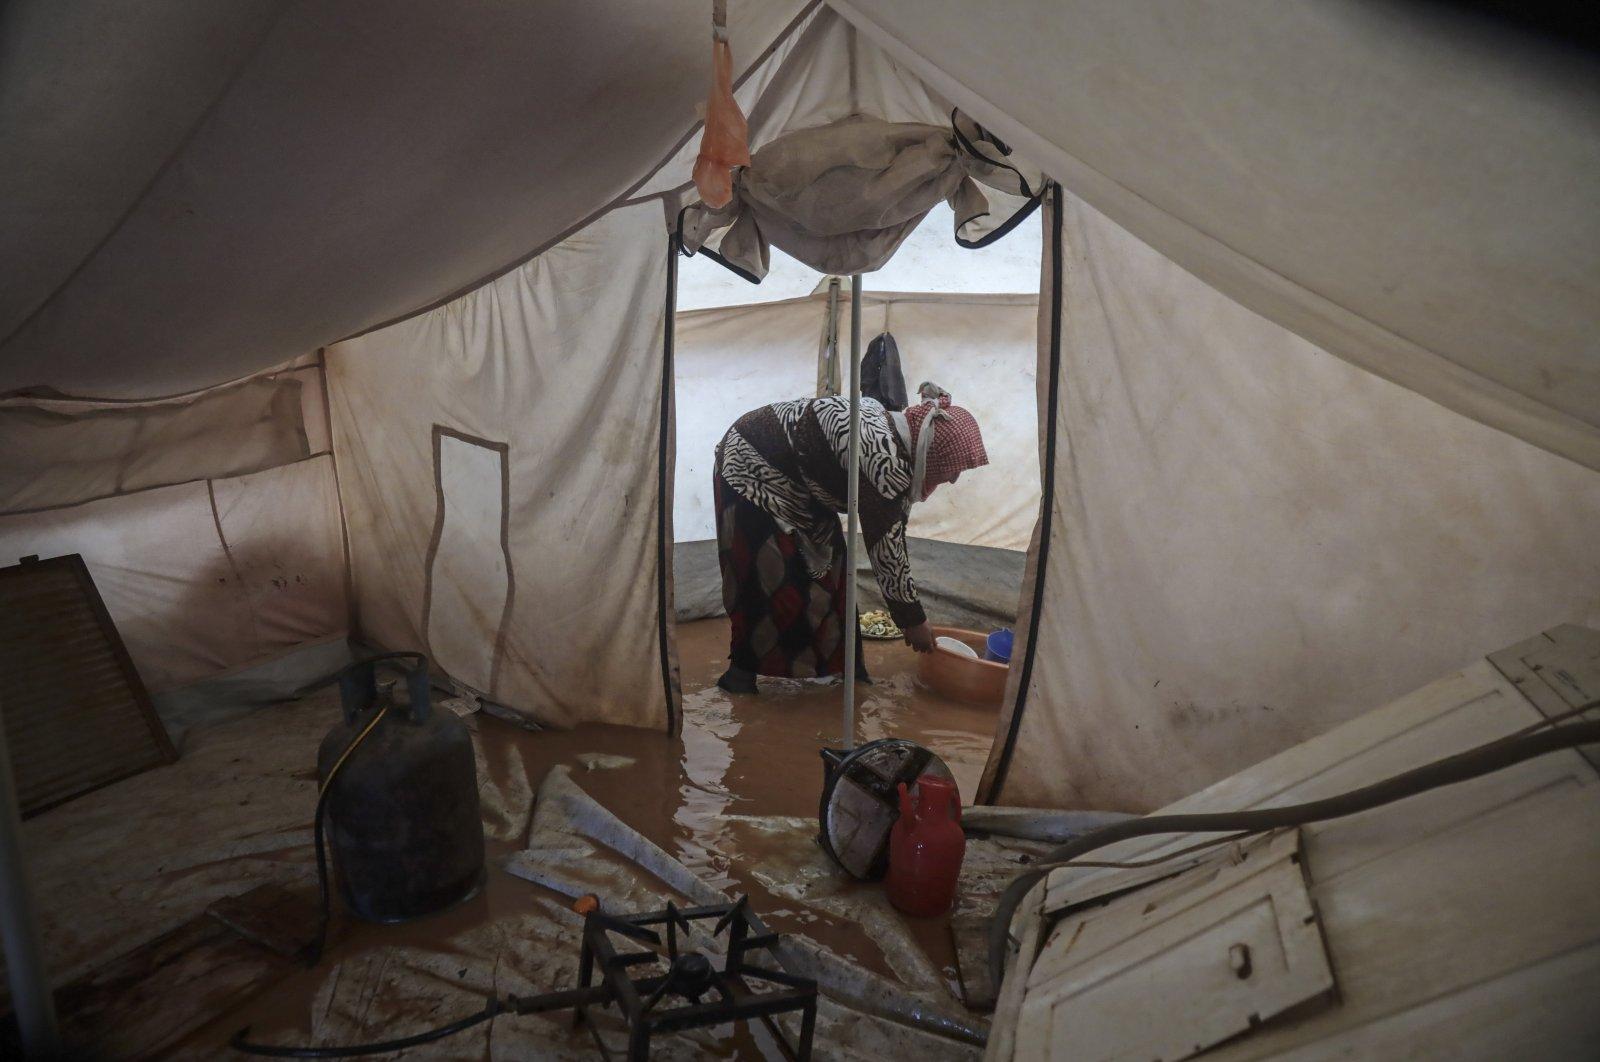 Heavy rains in Syria's northwestern Idlib have flooded around 110 tents belonging to displaced civilians, Jan. 18, 2021. (AA Photo)